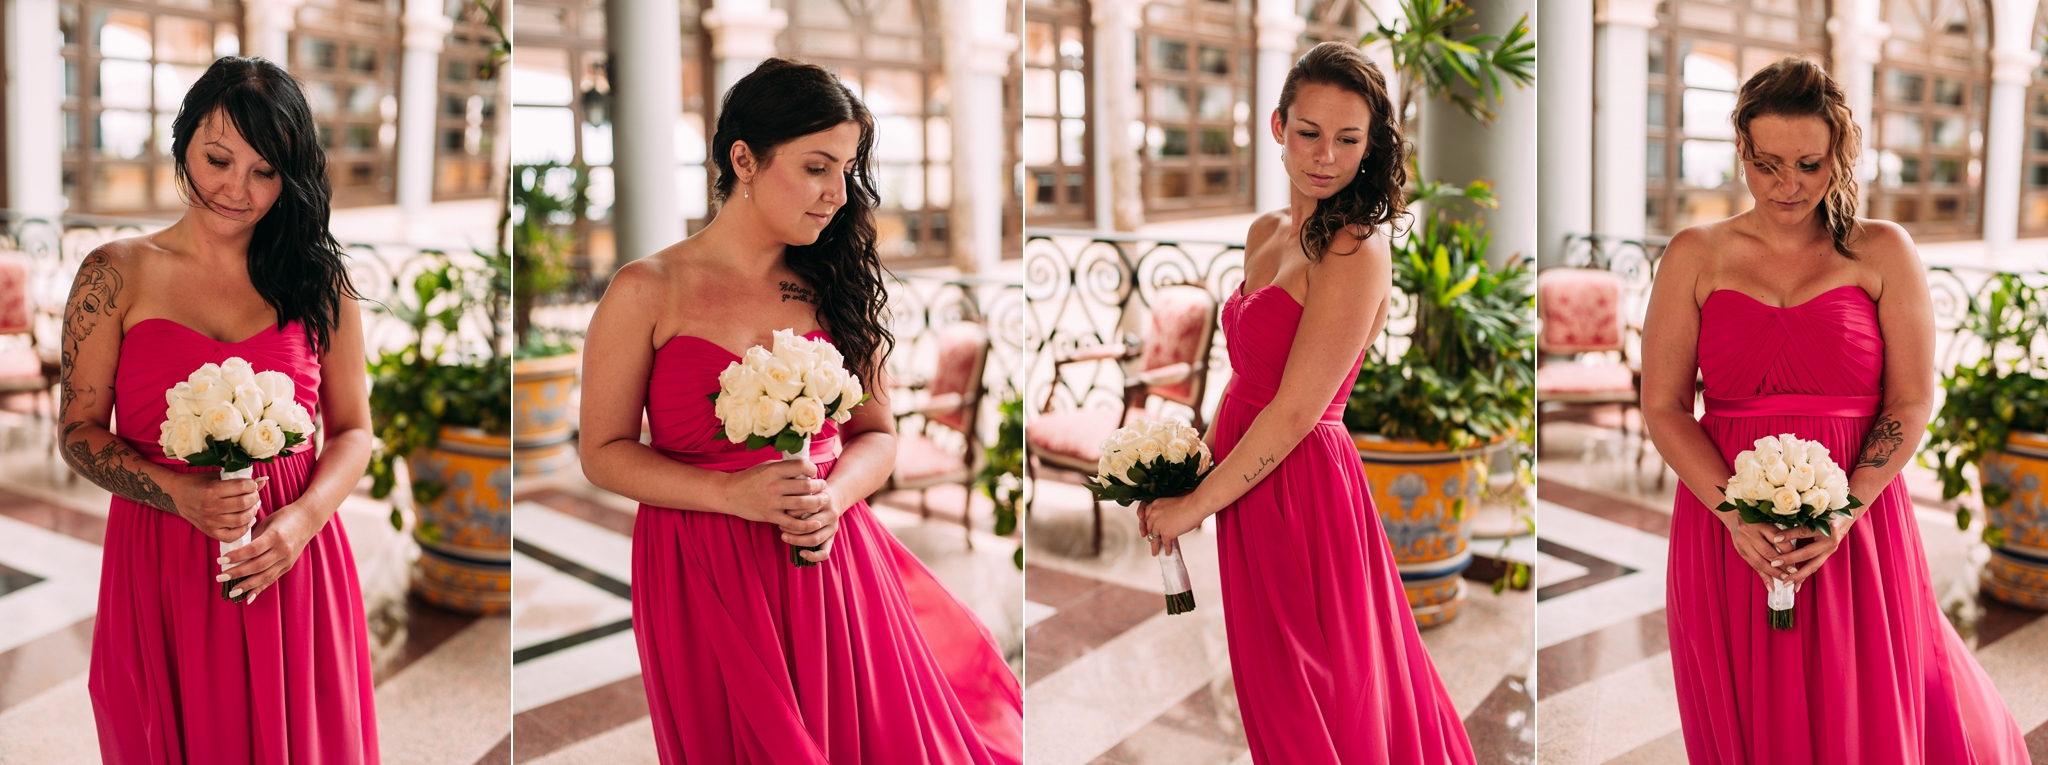 kaihla_tonai_intimate_wedding_elopement_photographer_1355